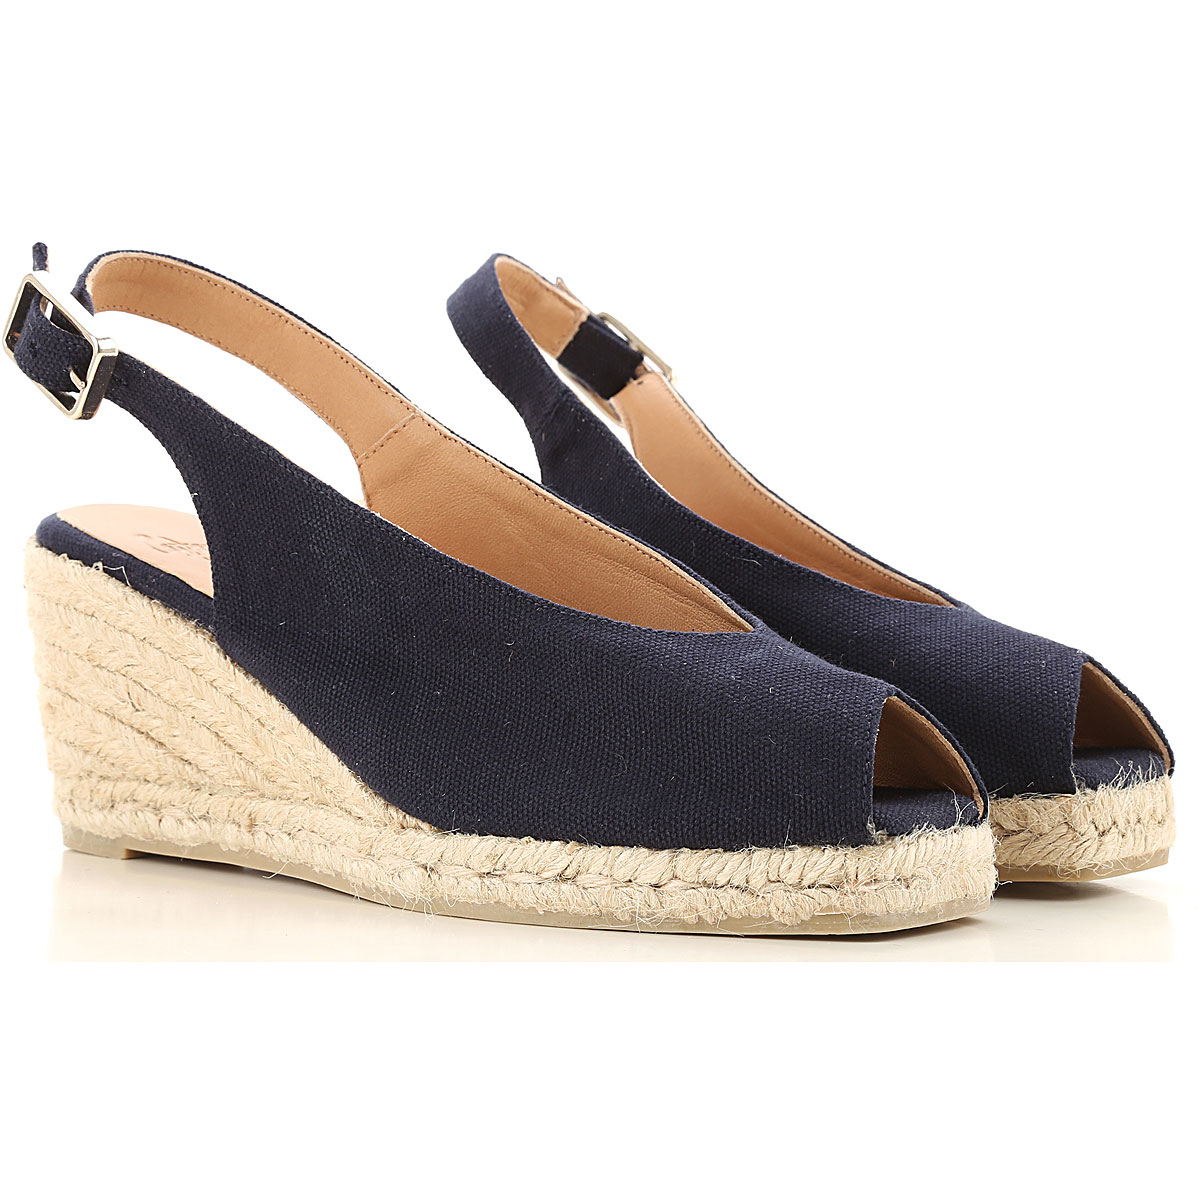 Castaner Sandals for Women On Sale in Outlet, Blue Navy, Canvas, 2019, 6